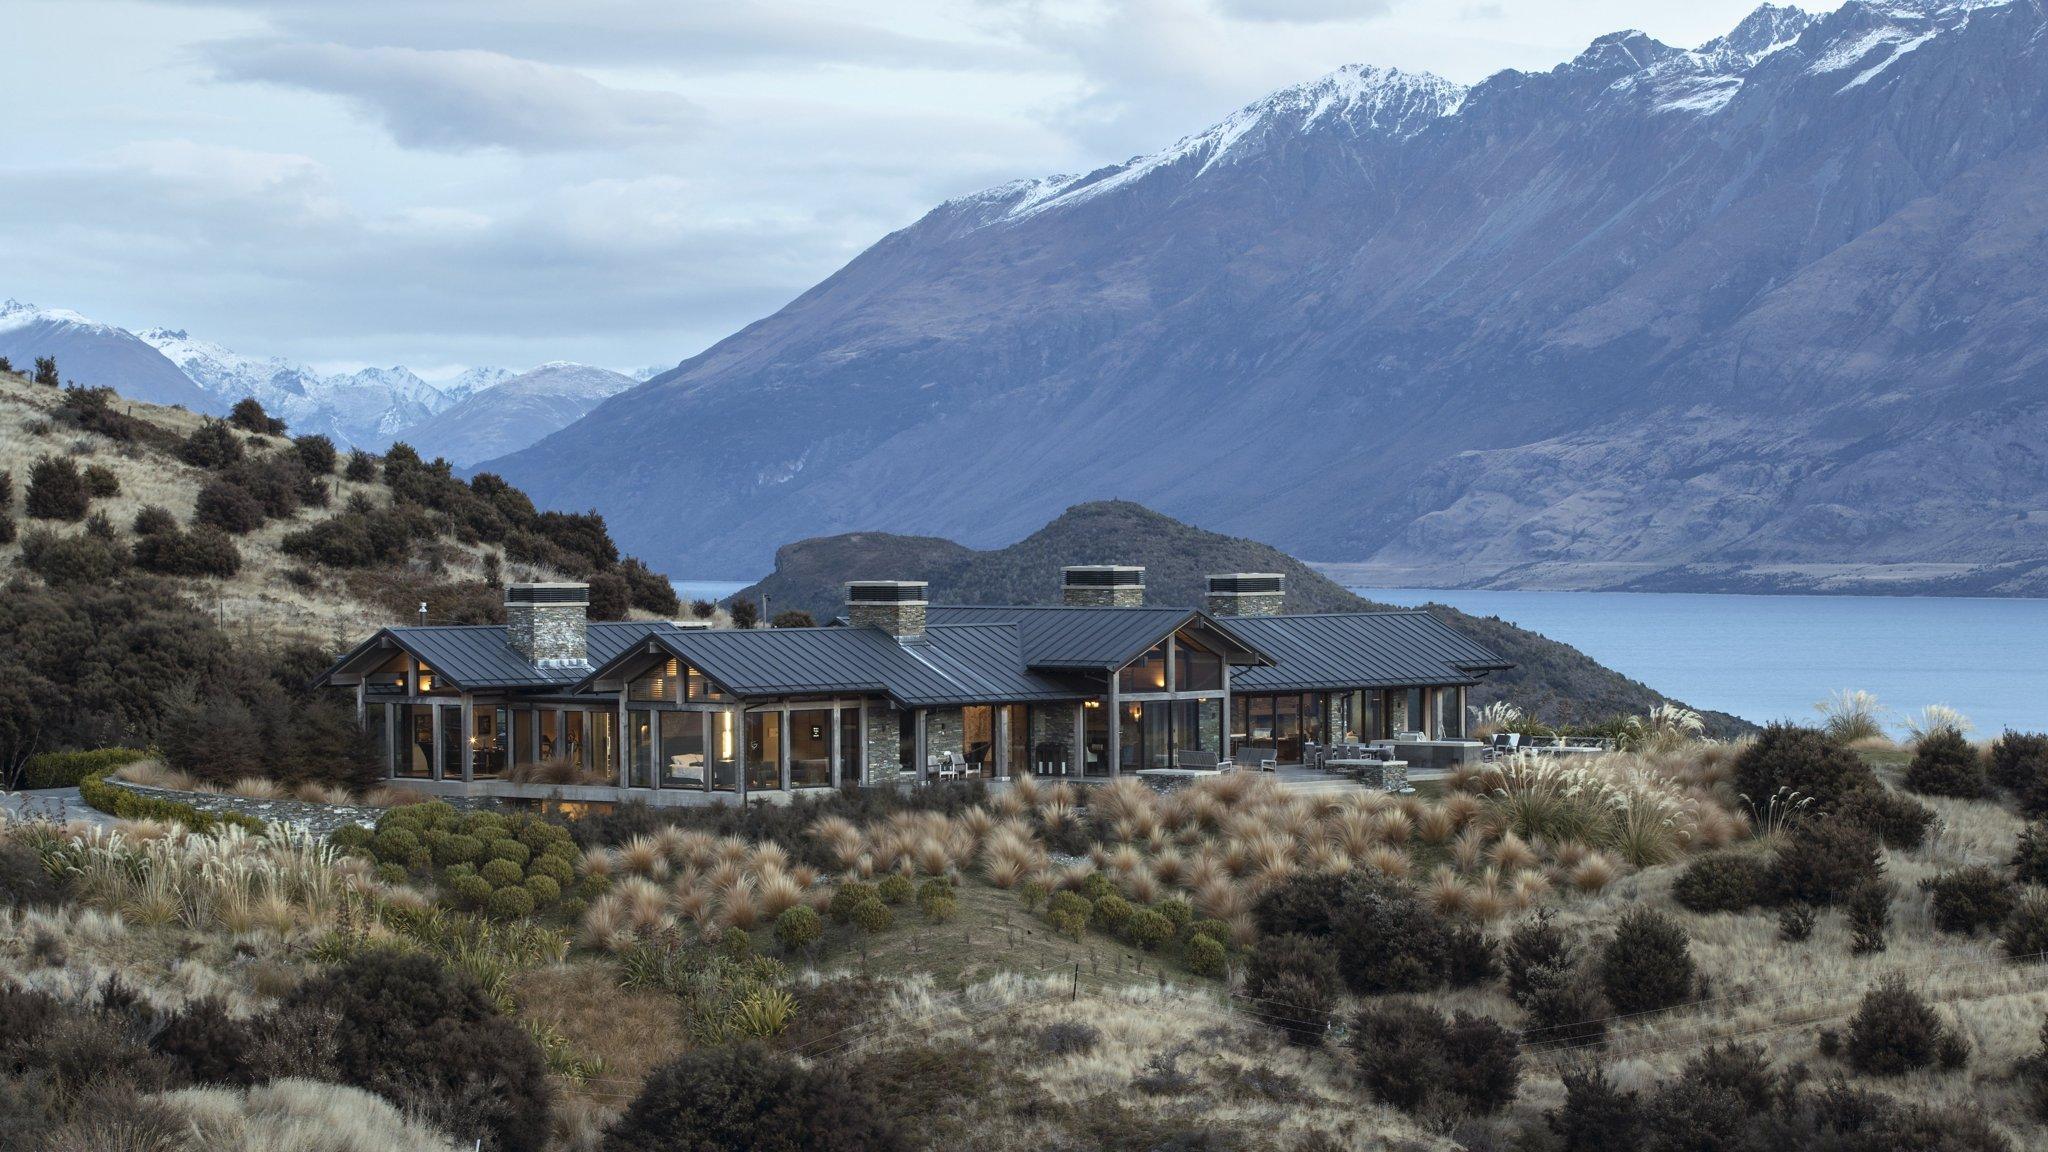 Billionaire bolt-holes' under threat in New Zealand